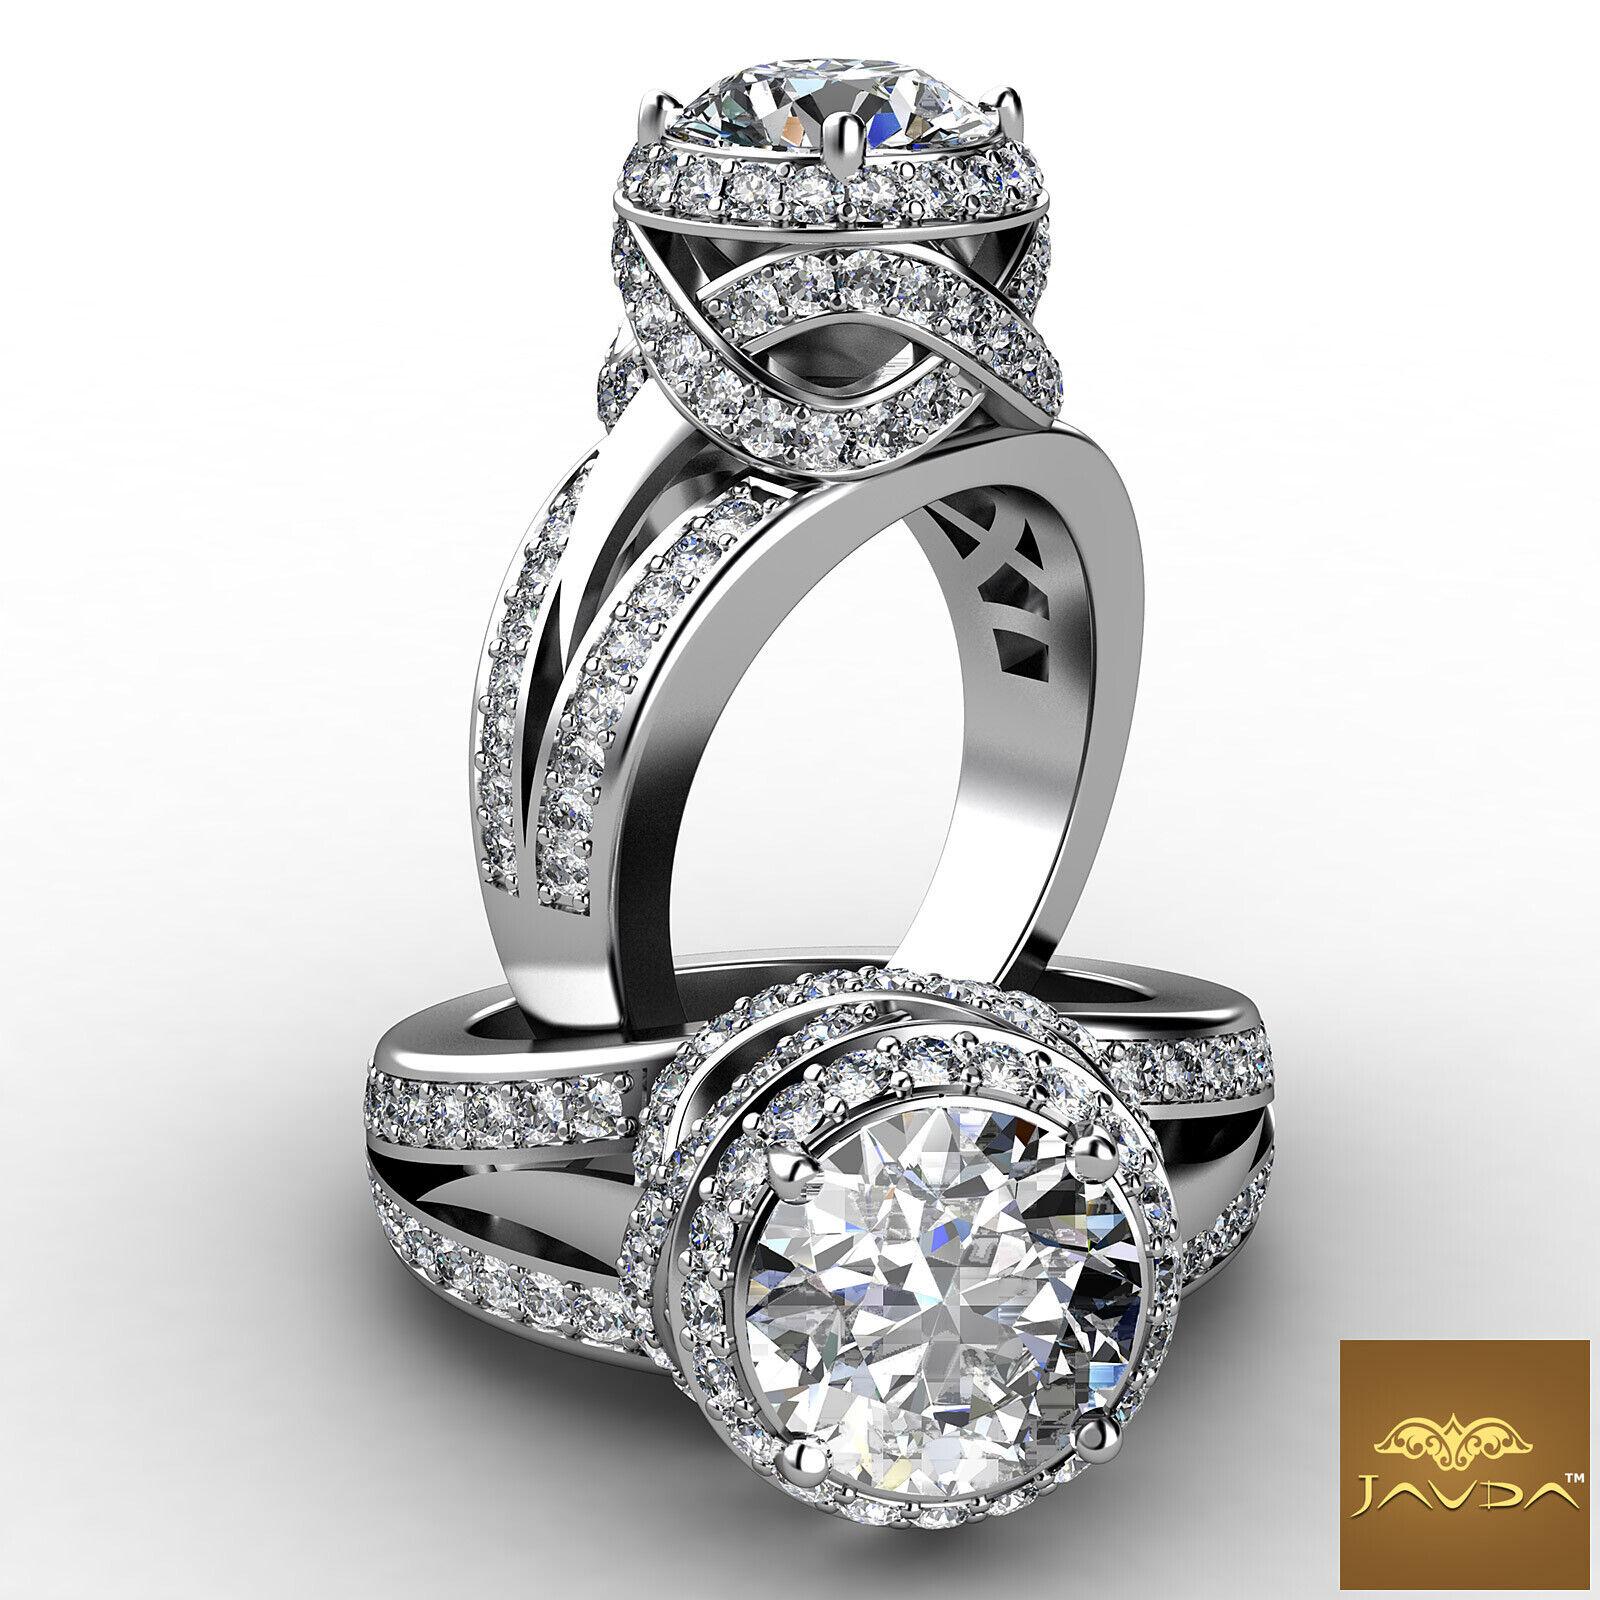 Circa Halo Pave Round Diamond Engagement Split Shank Ring GIA F Color VS1 2.8Ct